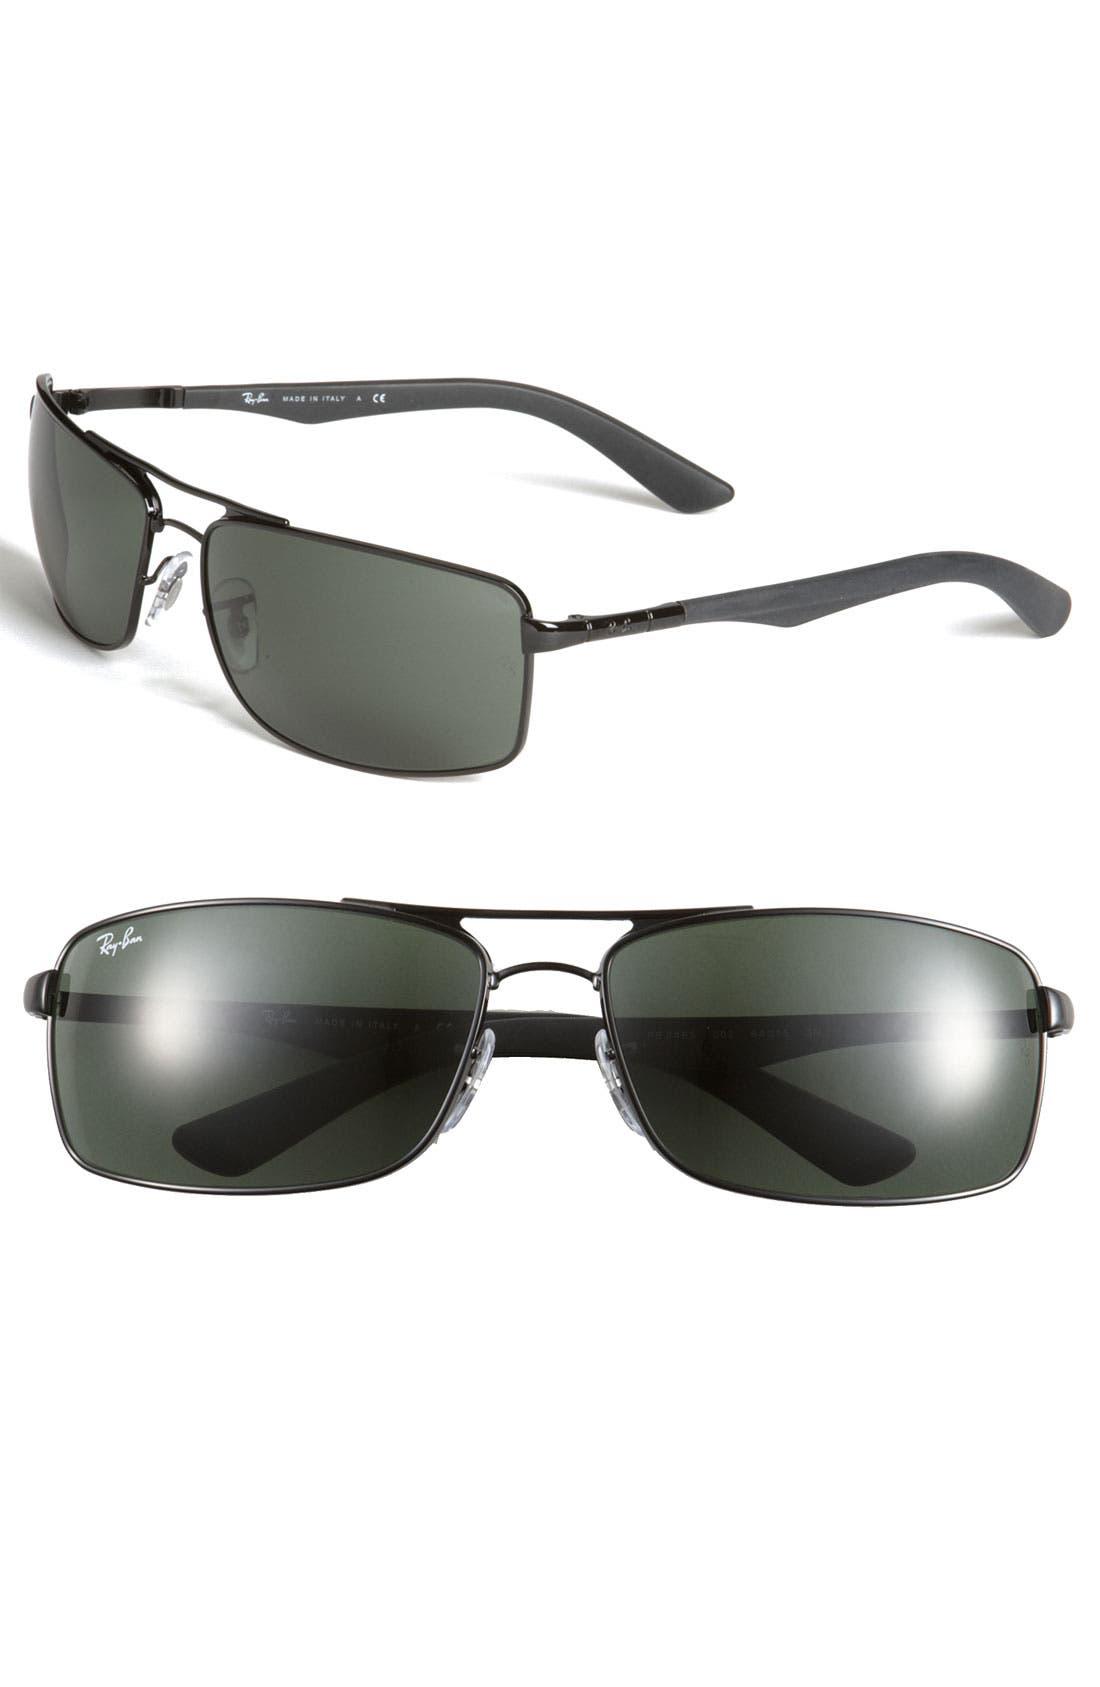 Main Image - Ray-Ban Double Bridge 64mm Rectangular Sunglasses